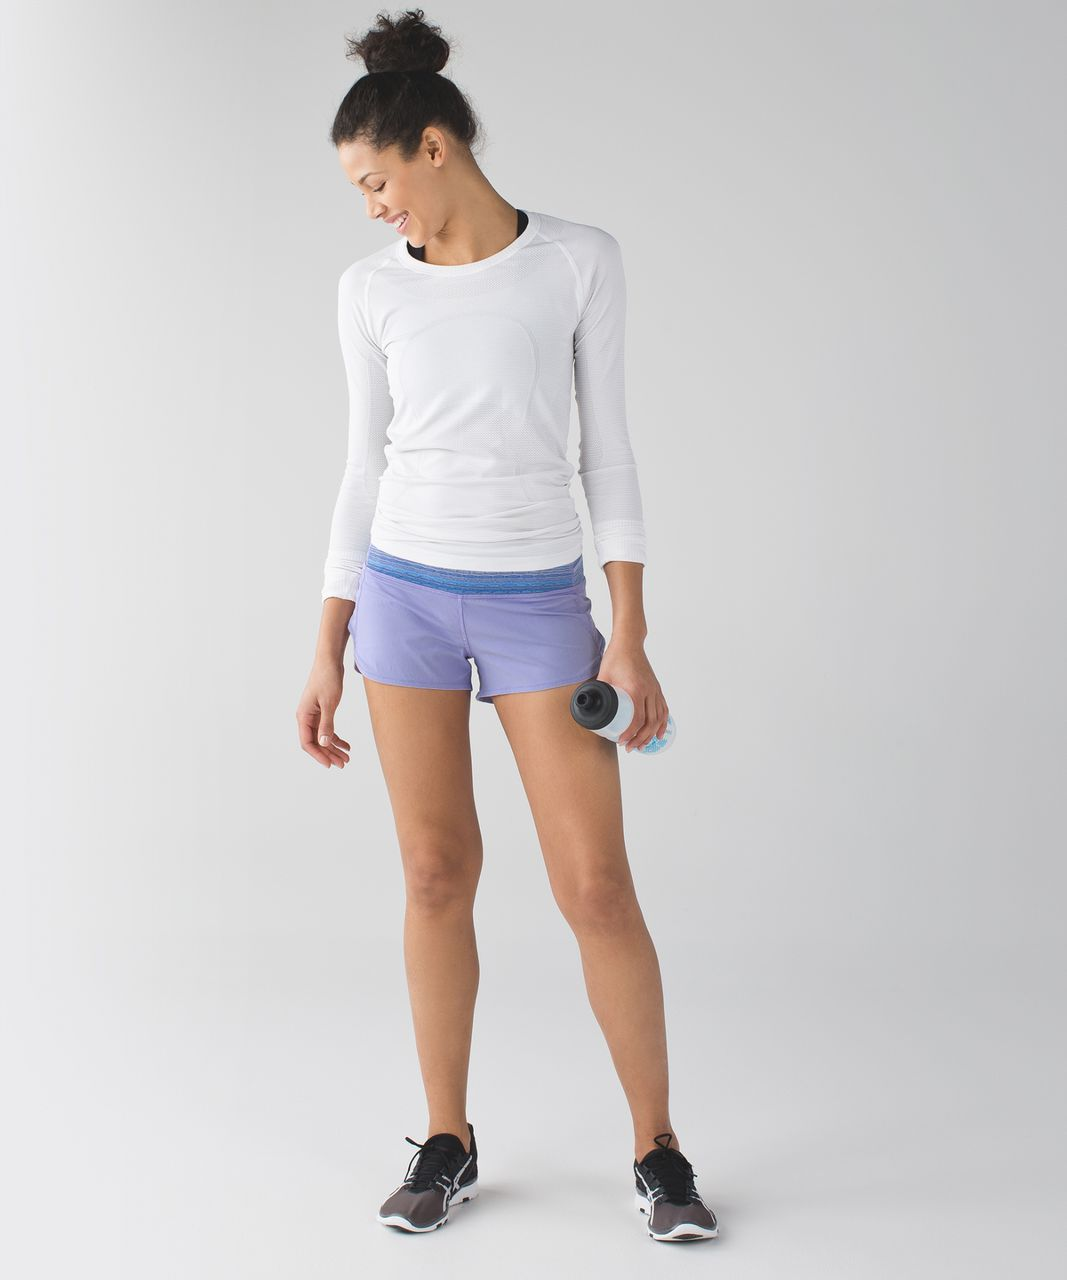 Lululemon Speed Short *4-way Stretch - Lilac / Wave Twist Lilac Caspian Blue